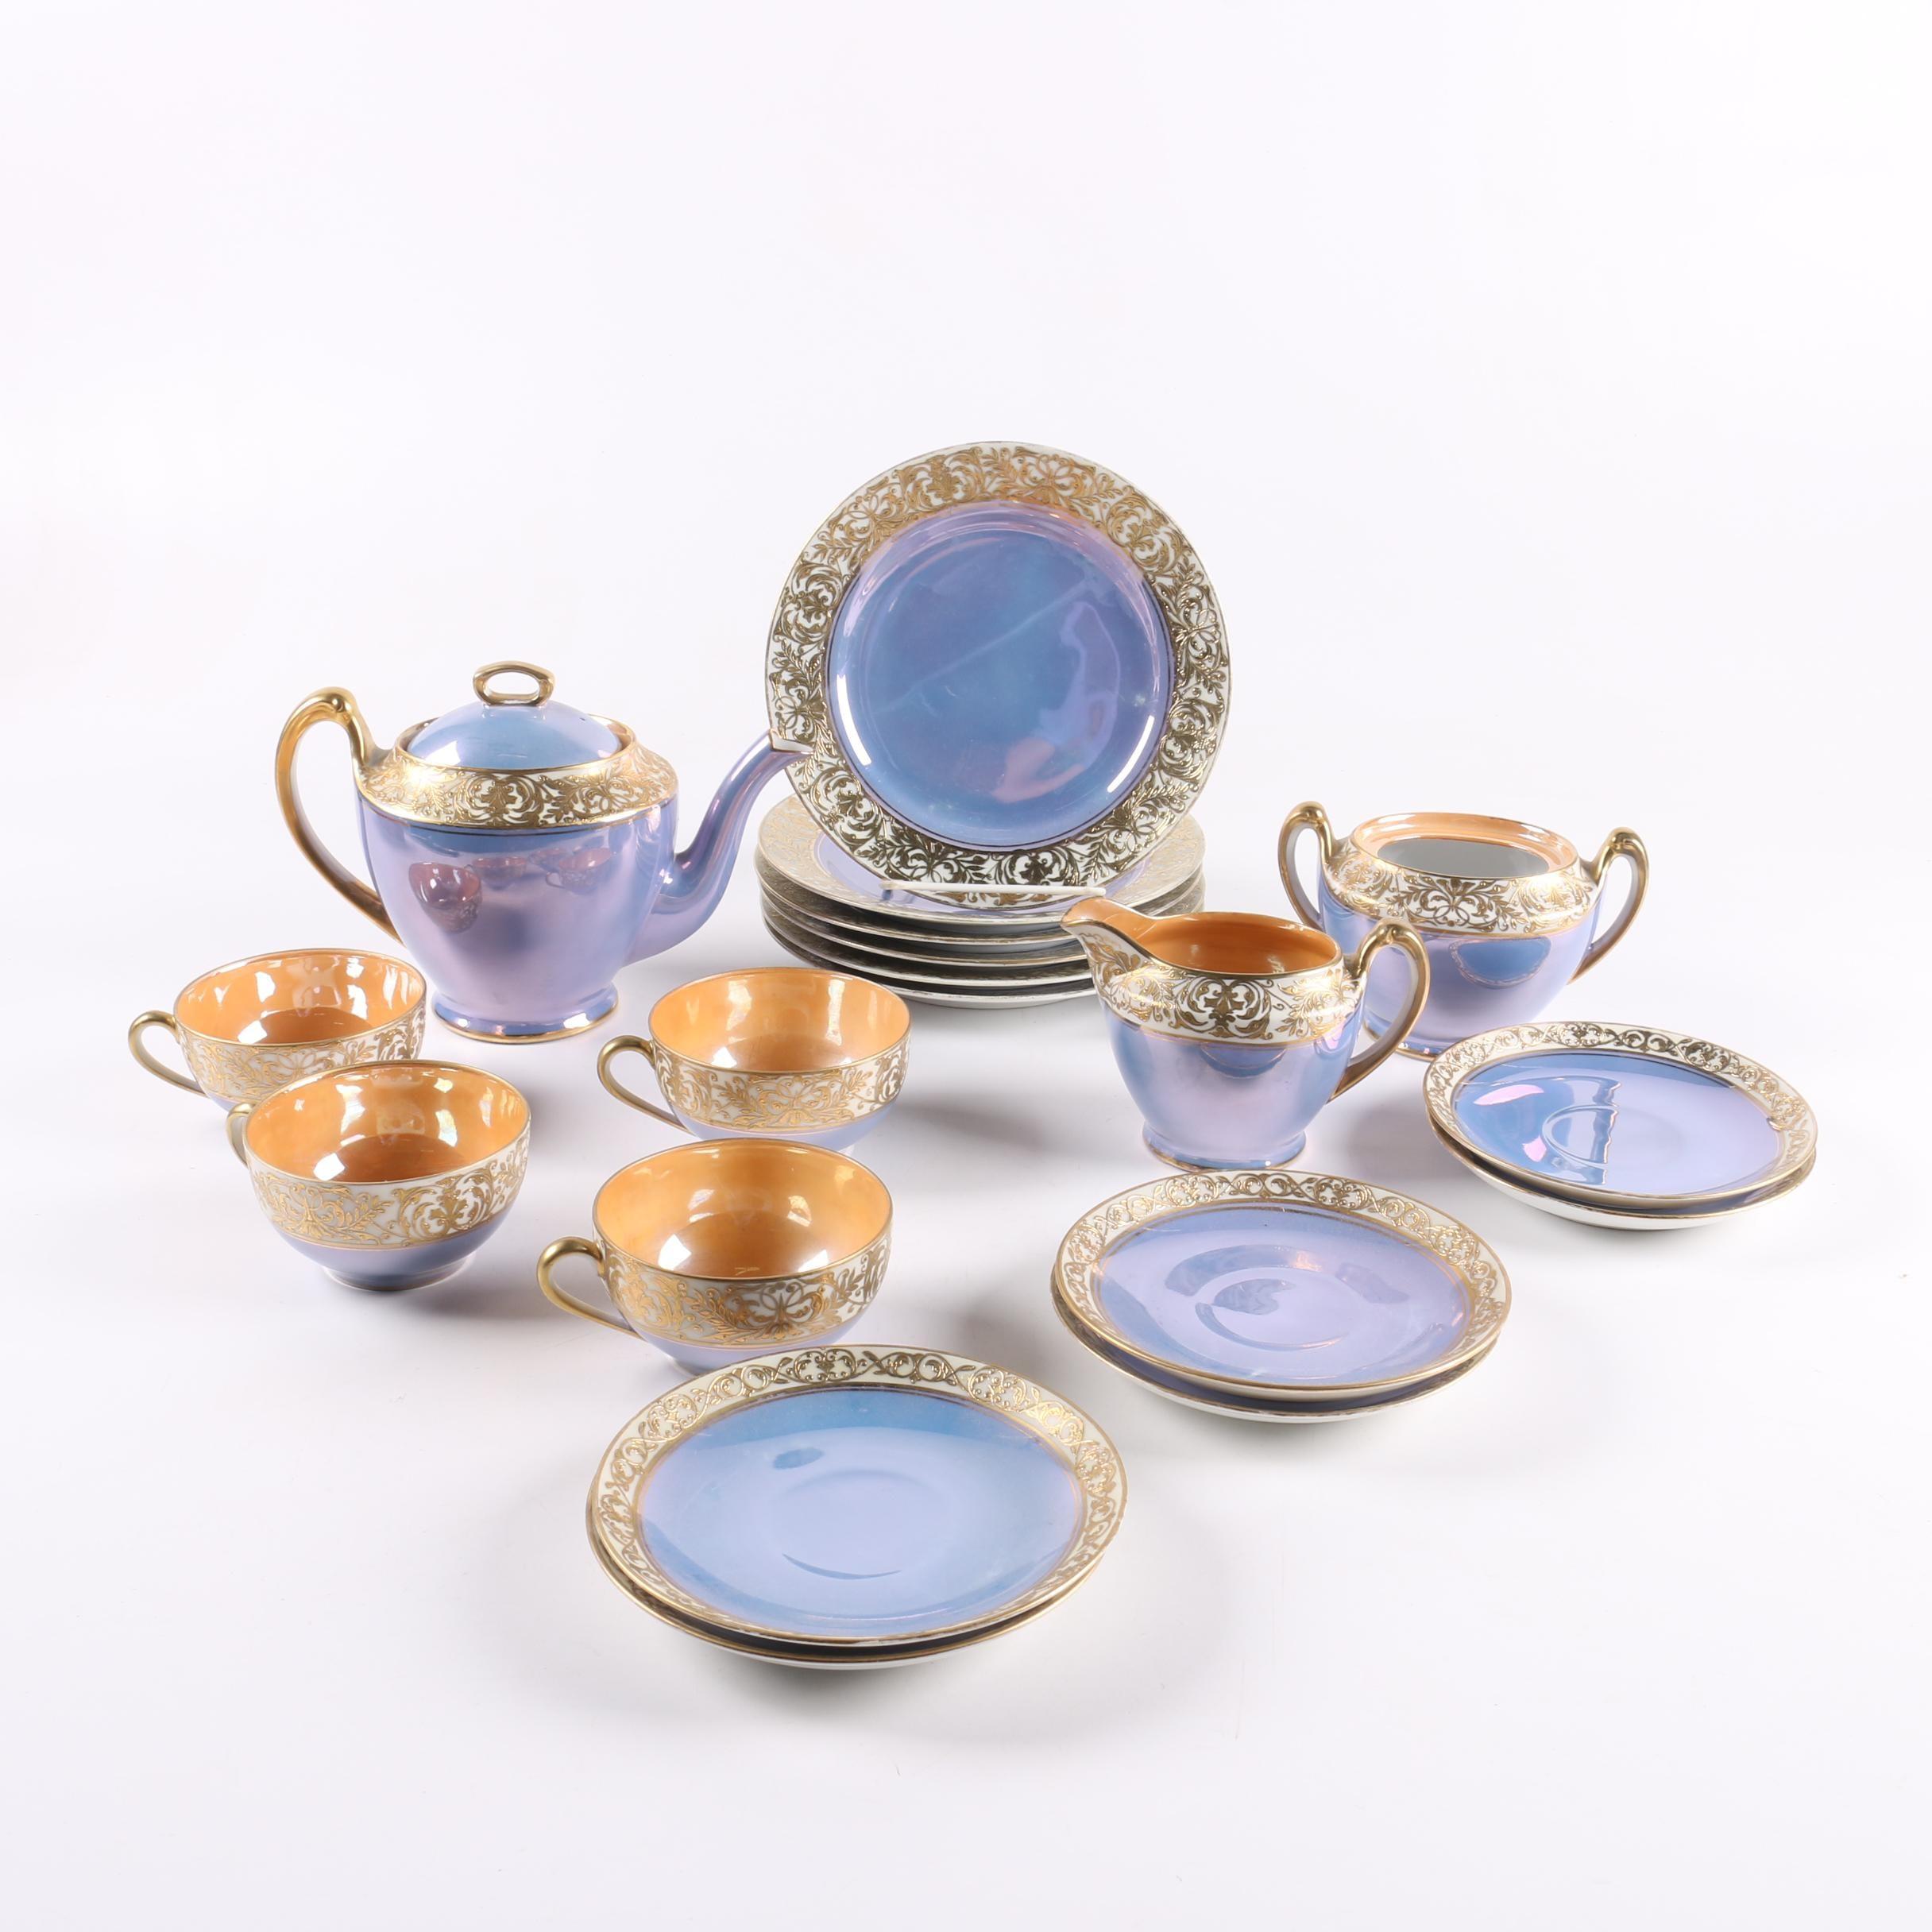 Noritake Blue and Orange Lustreware Tableware